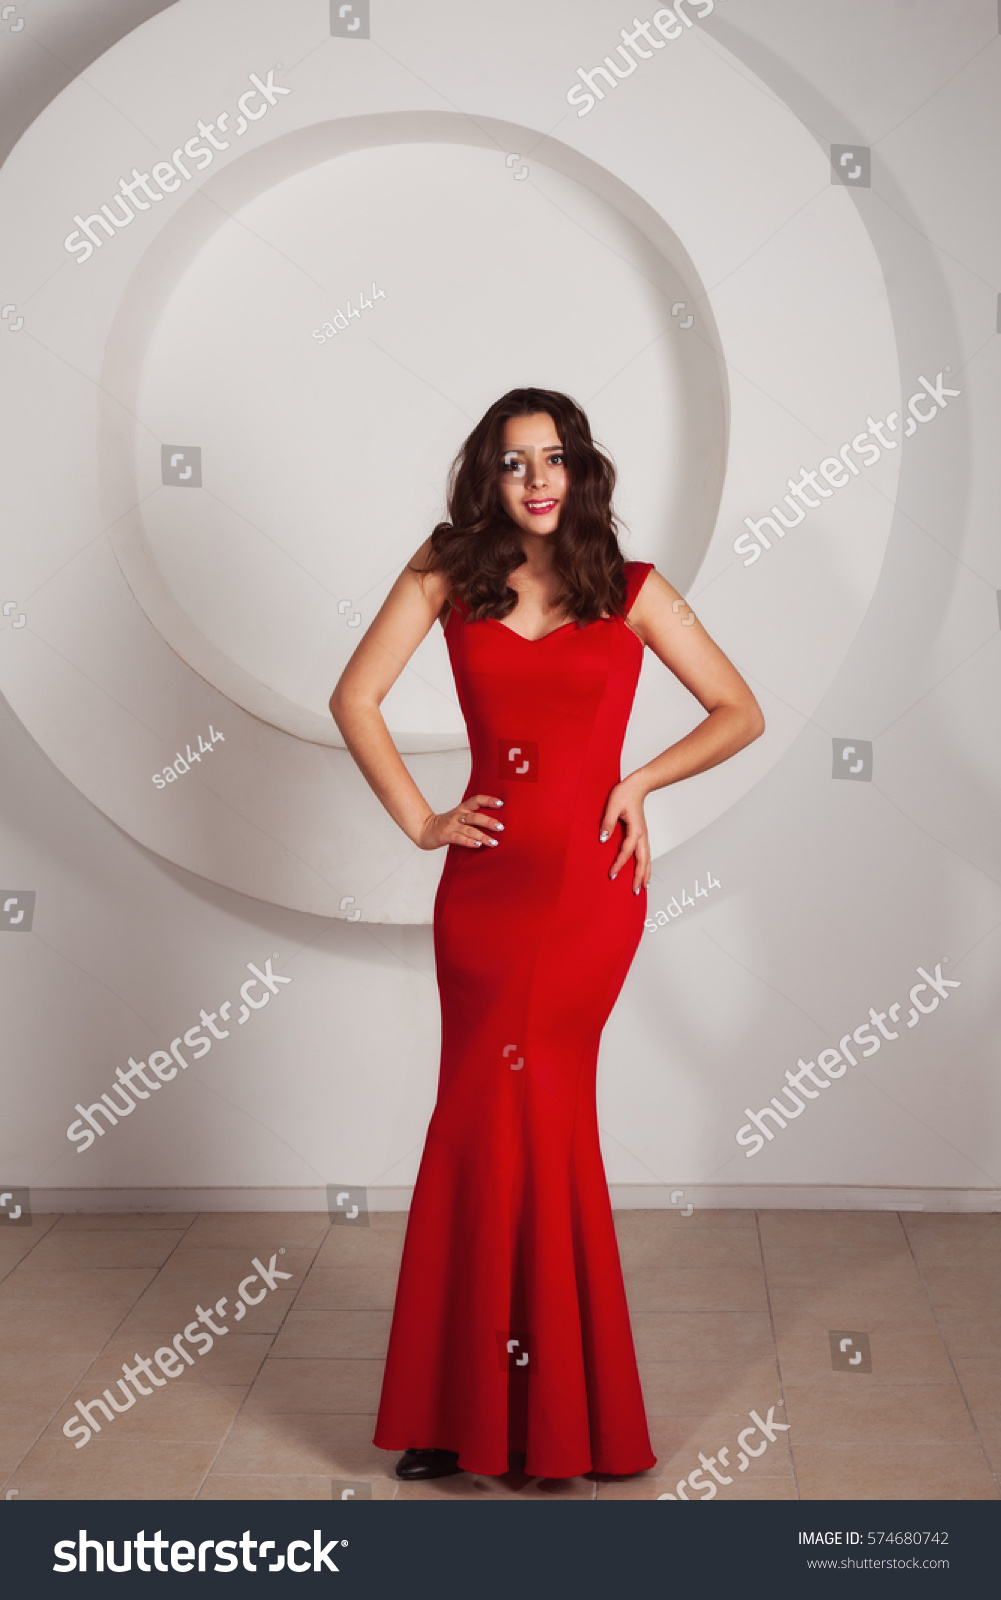 Beautiful Brunette Formal Red Dress Stock Photo 574680742 Shutterstock